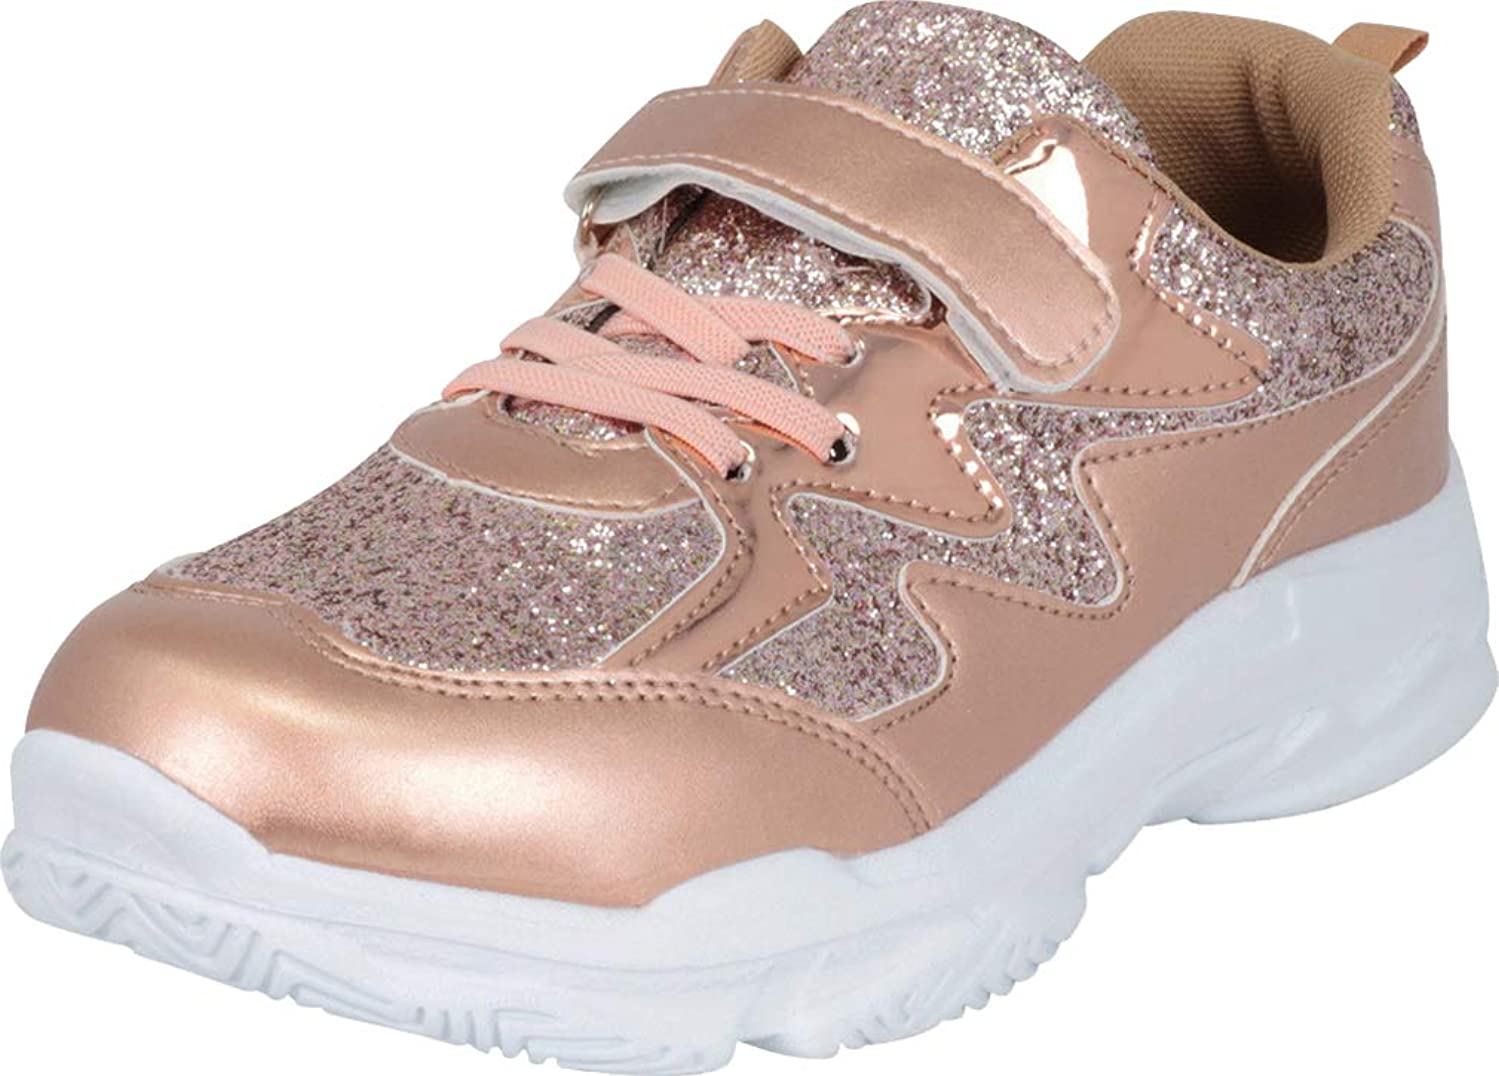 Cambridge Select Girls' Lace-Up Strap Glitter Fashion Sneaker (Toddler/Little Kid/Big Kid)